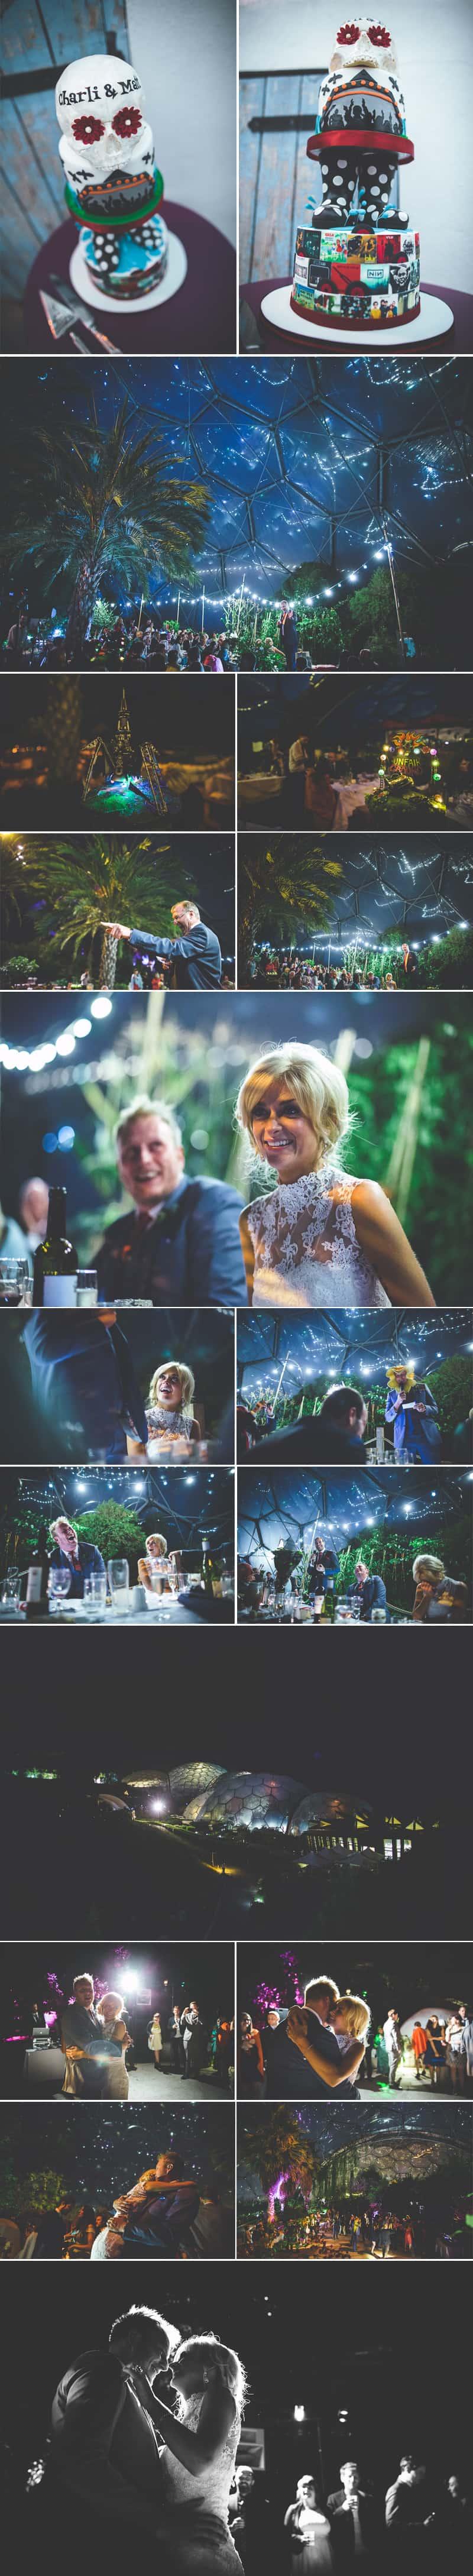 Glastonbury Eden Project Wedding Zip Lining Festival Themed 6